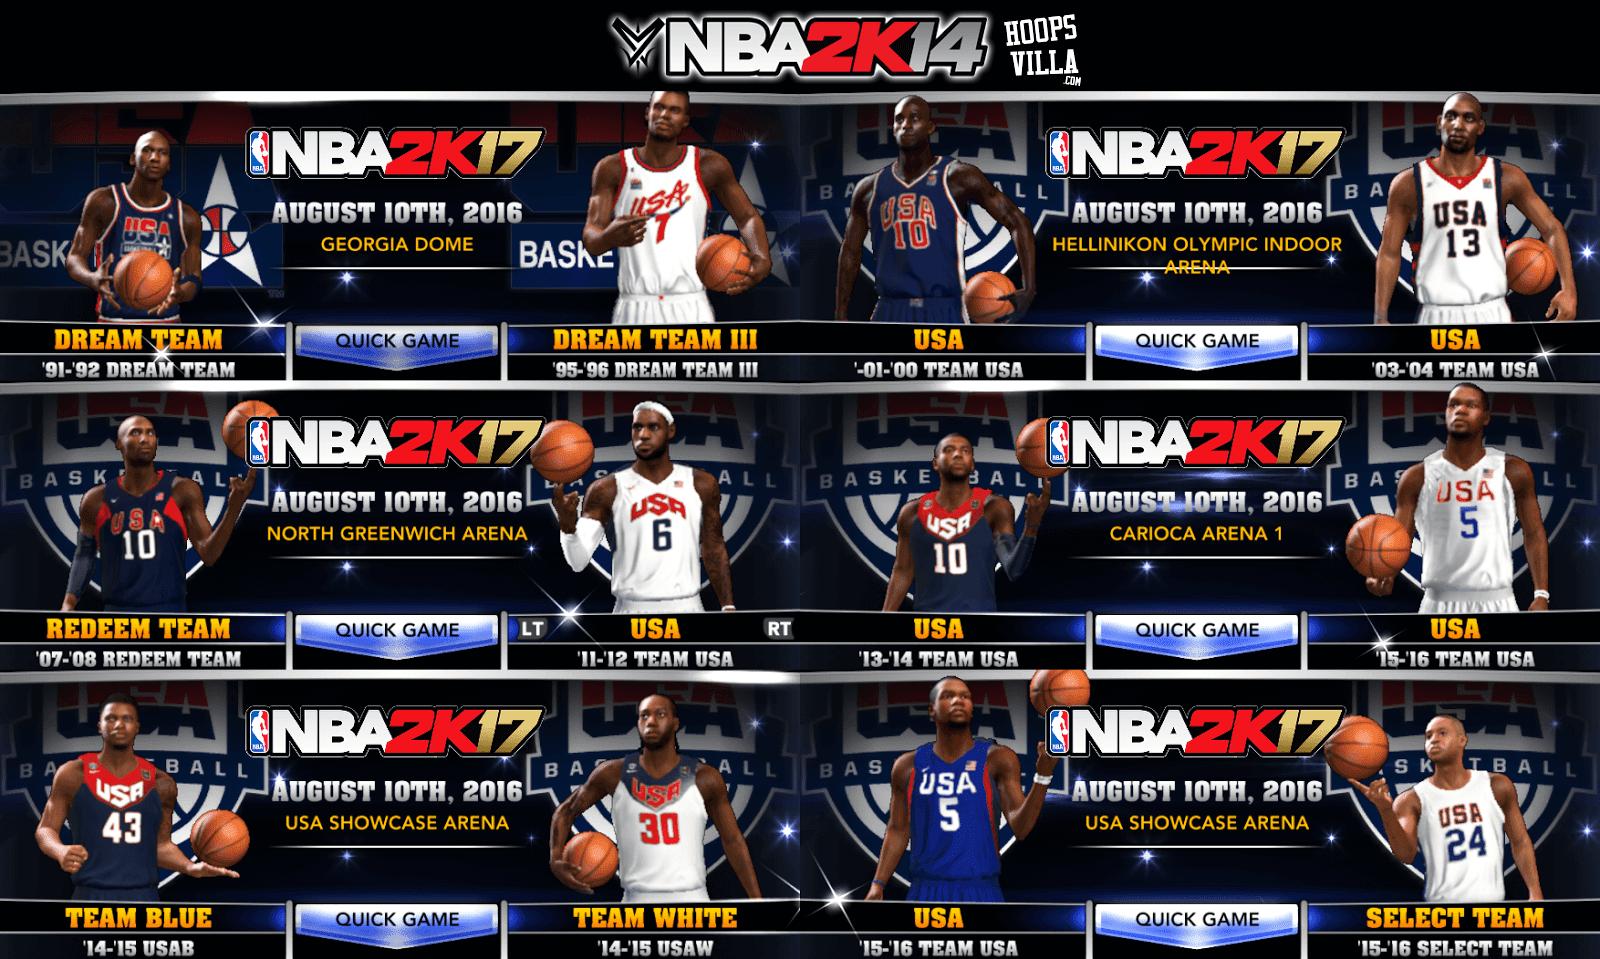 Roster nba 2k14 NBA 2k14